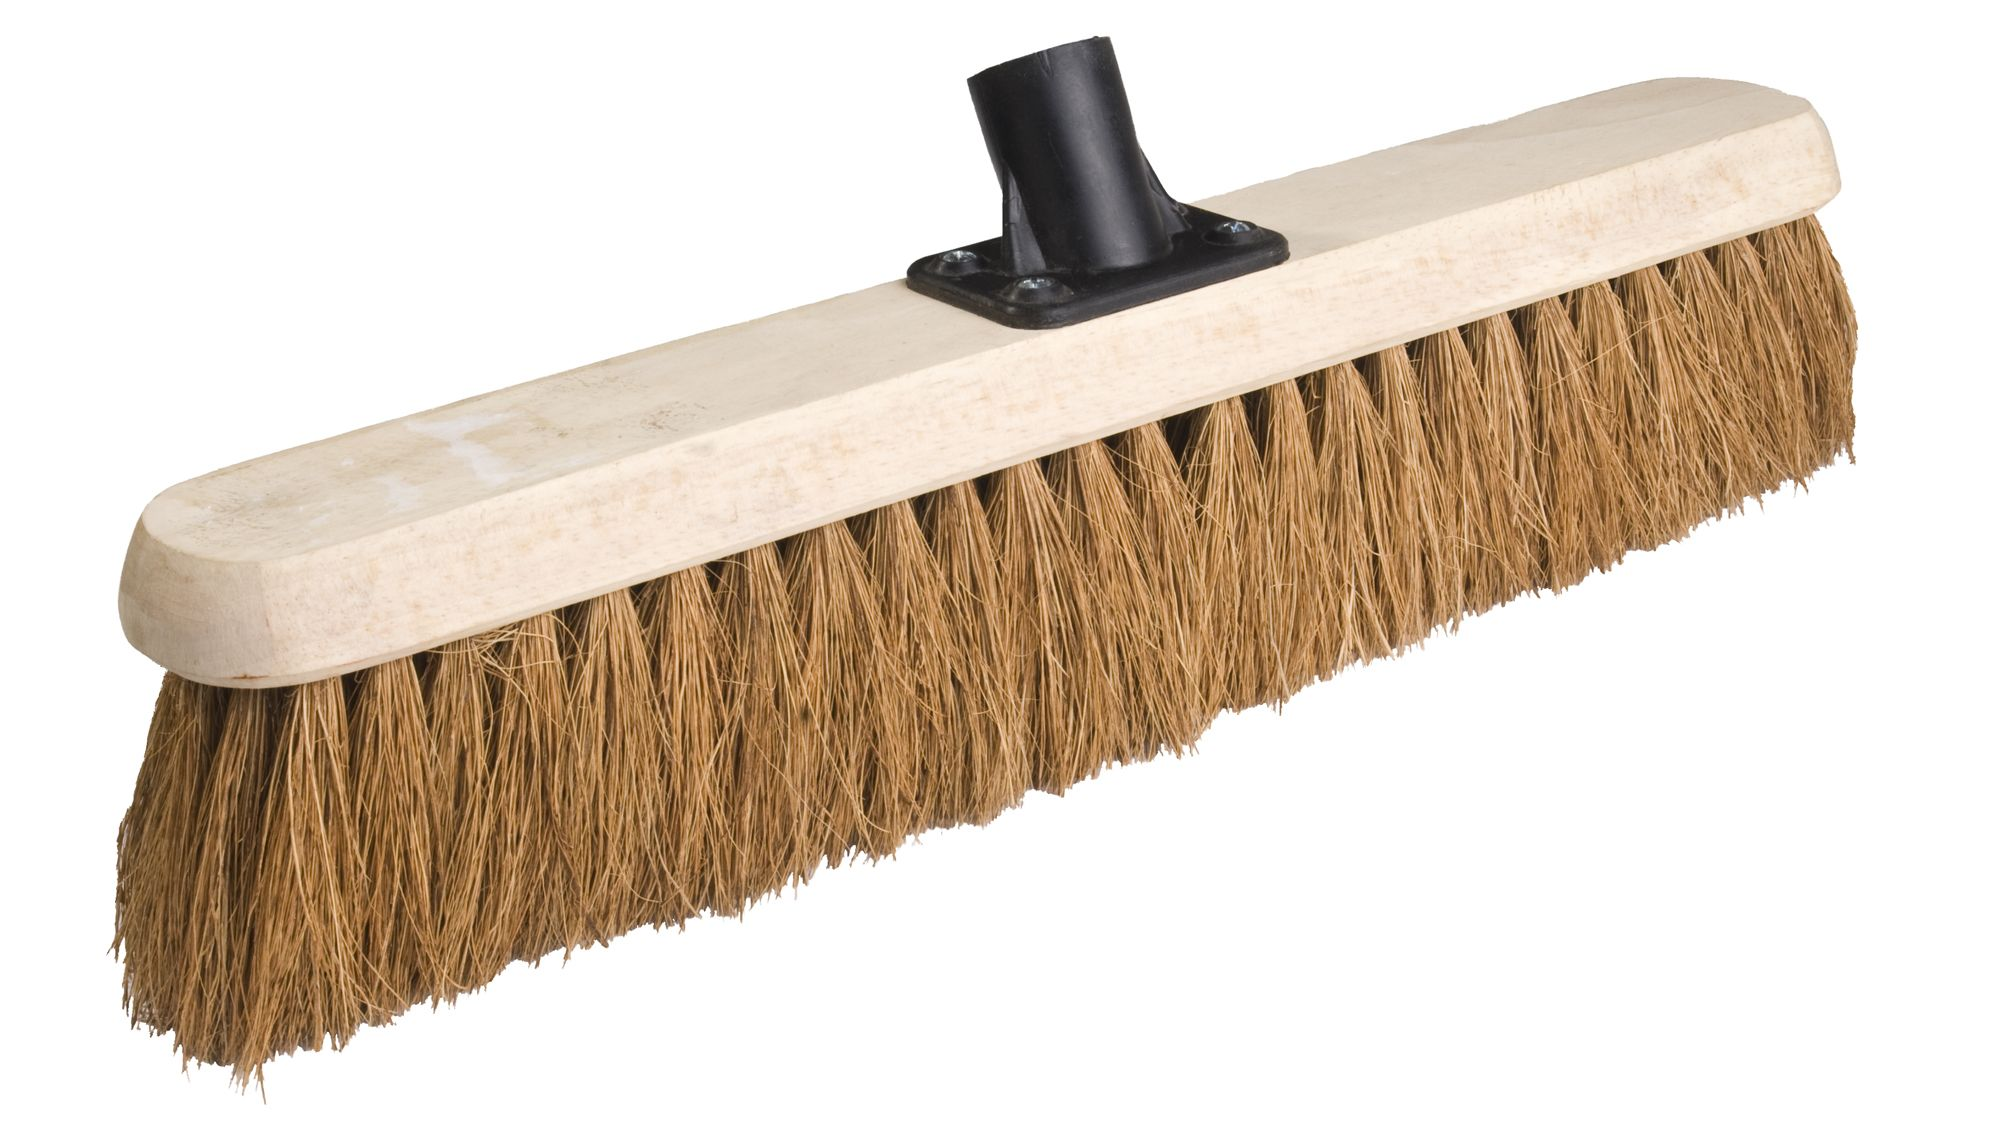 Harris Victory Broom Head W 70mm Departments Diy At B Amp Q